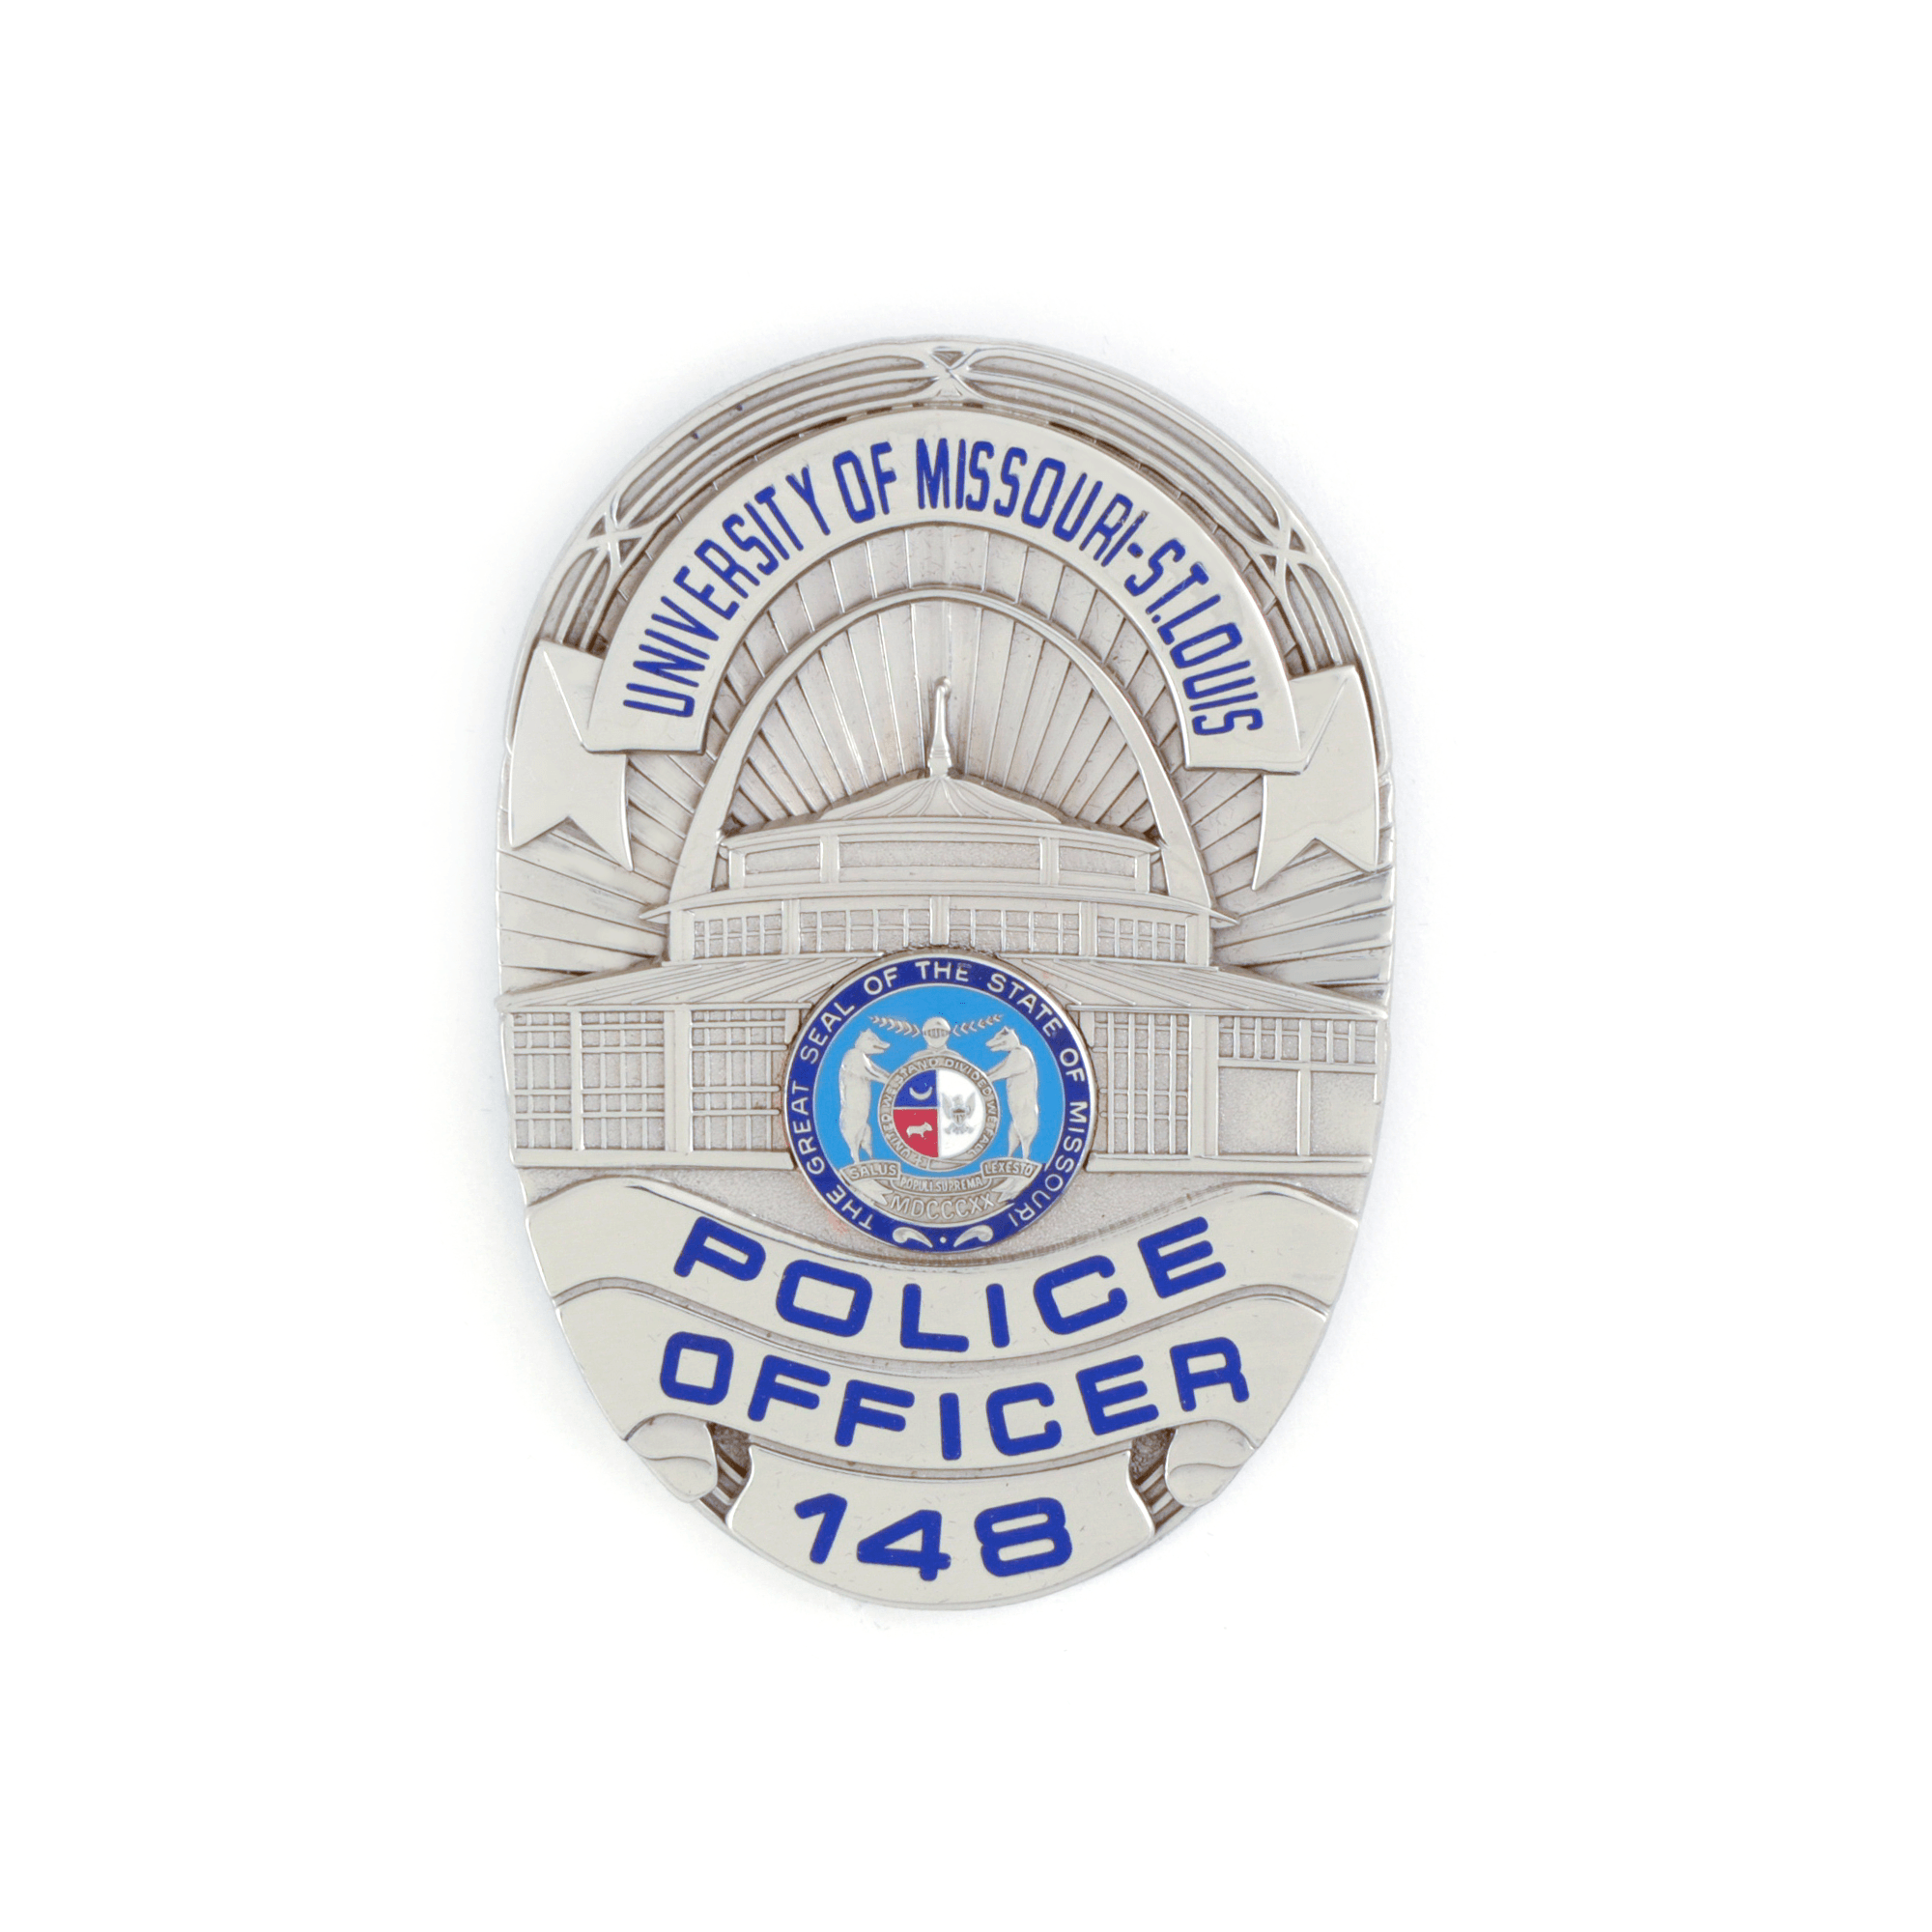 20-UofMissouri-StLouisPoliceOfficer.png